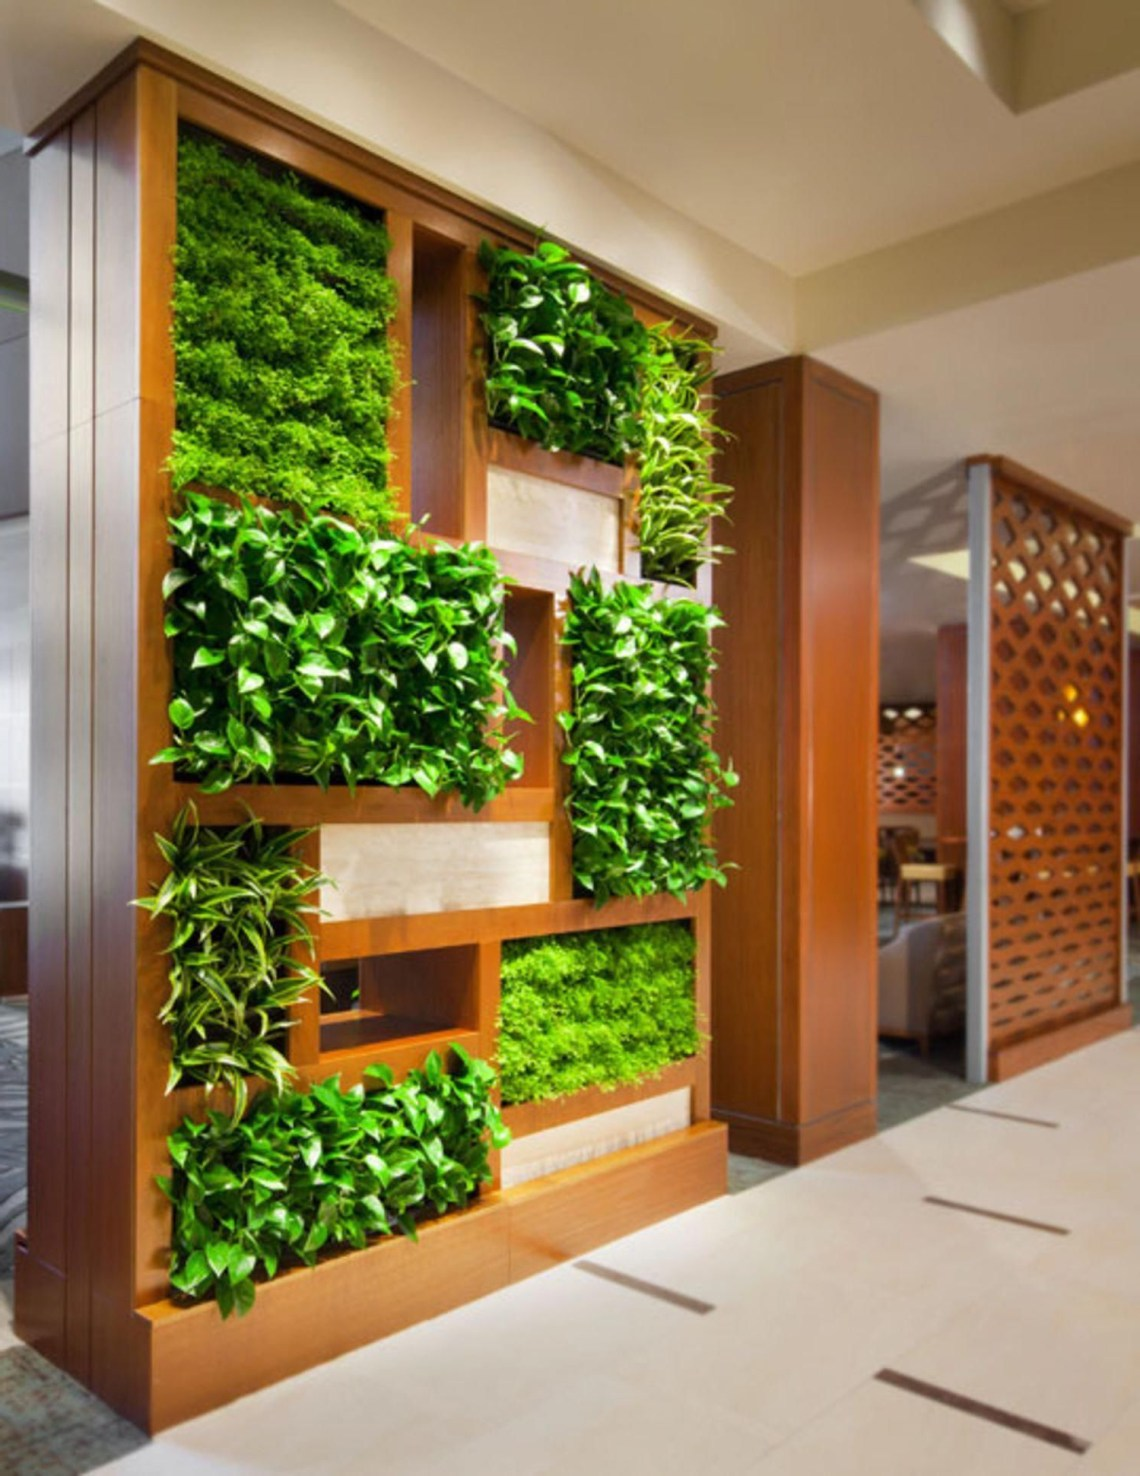 5 Sparkling Clever Ideas Vegetable Garden Markers Crafts